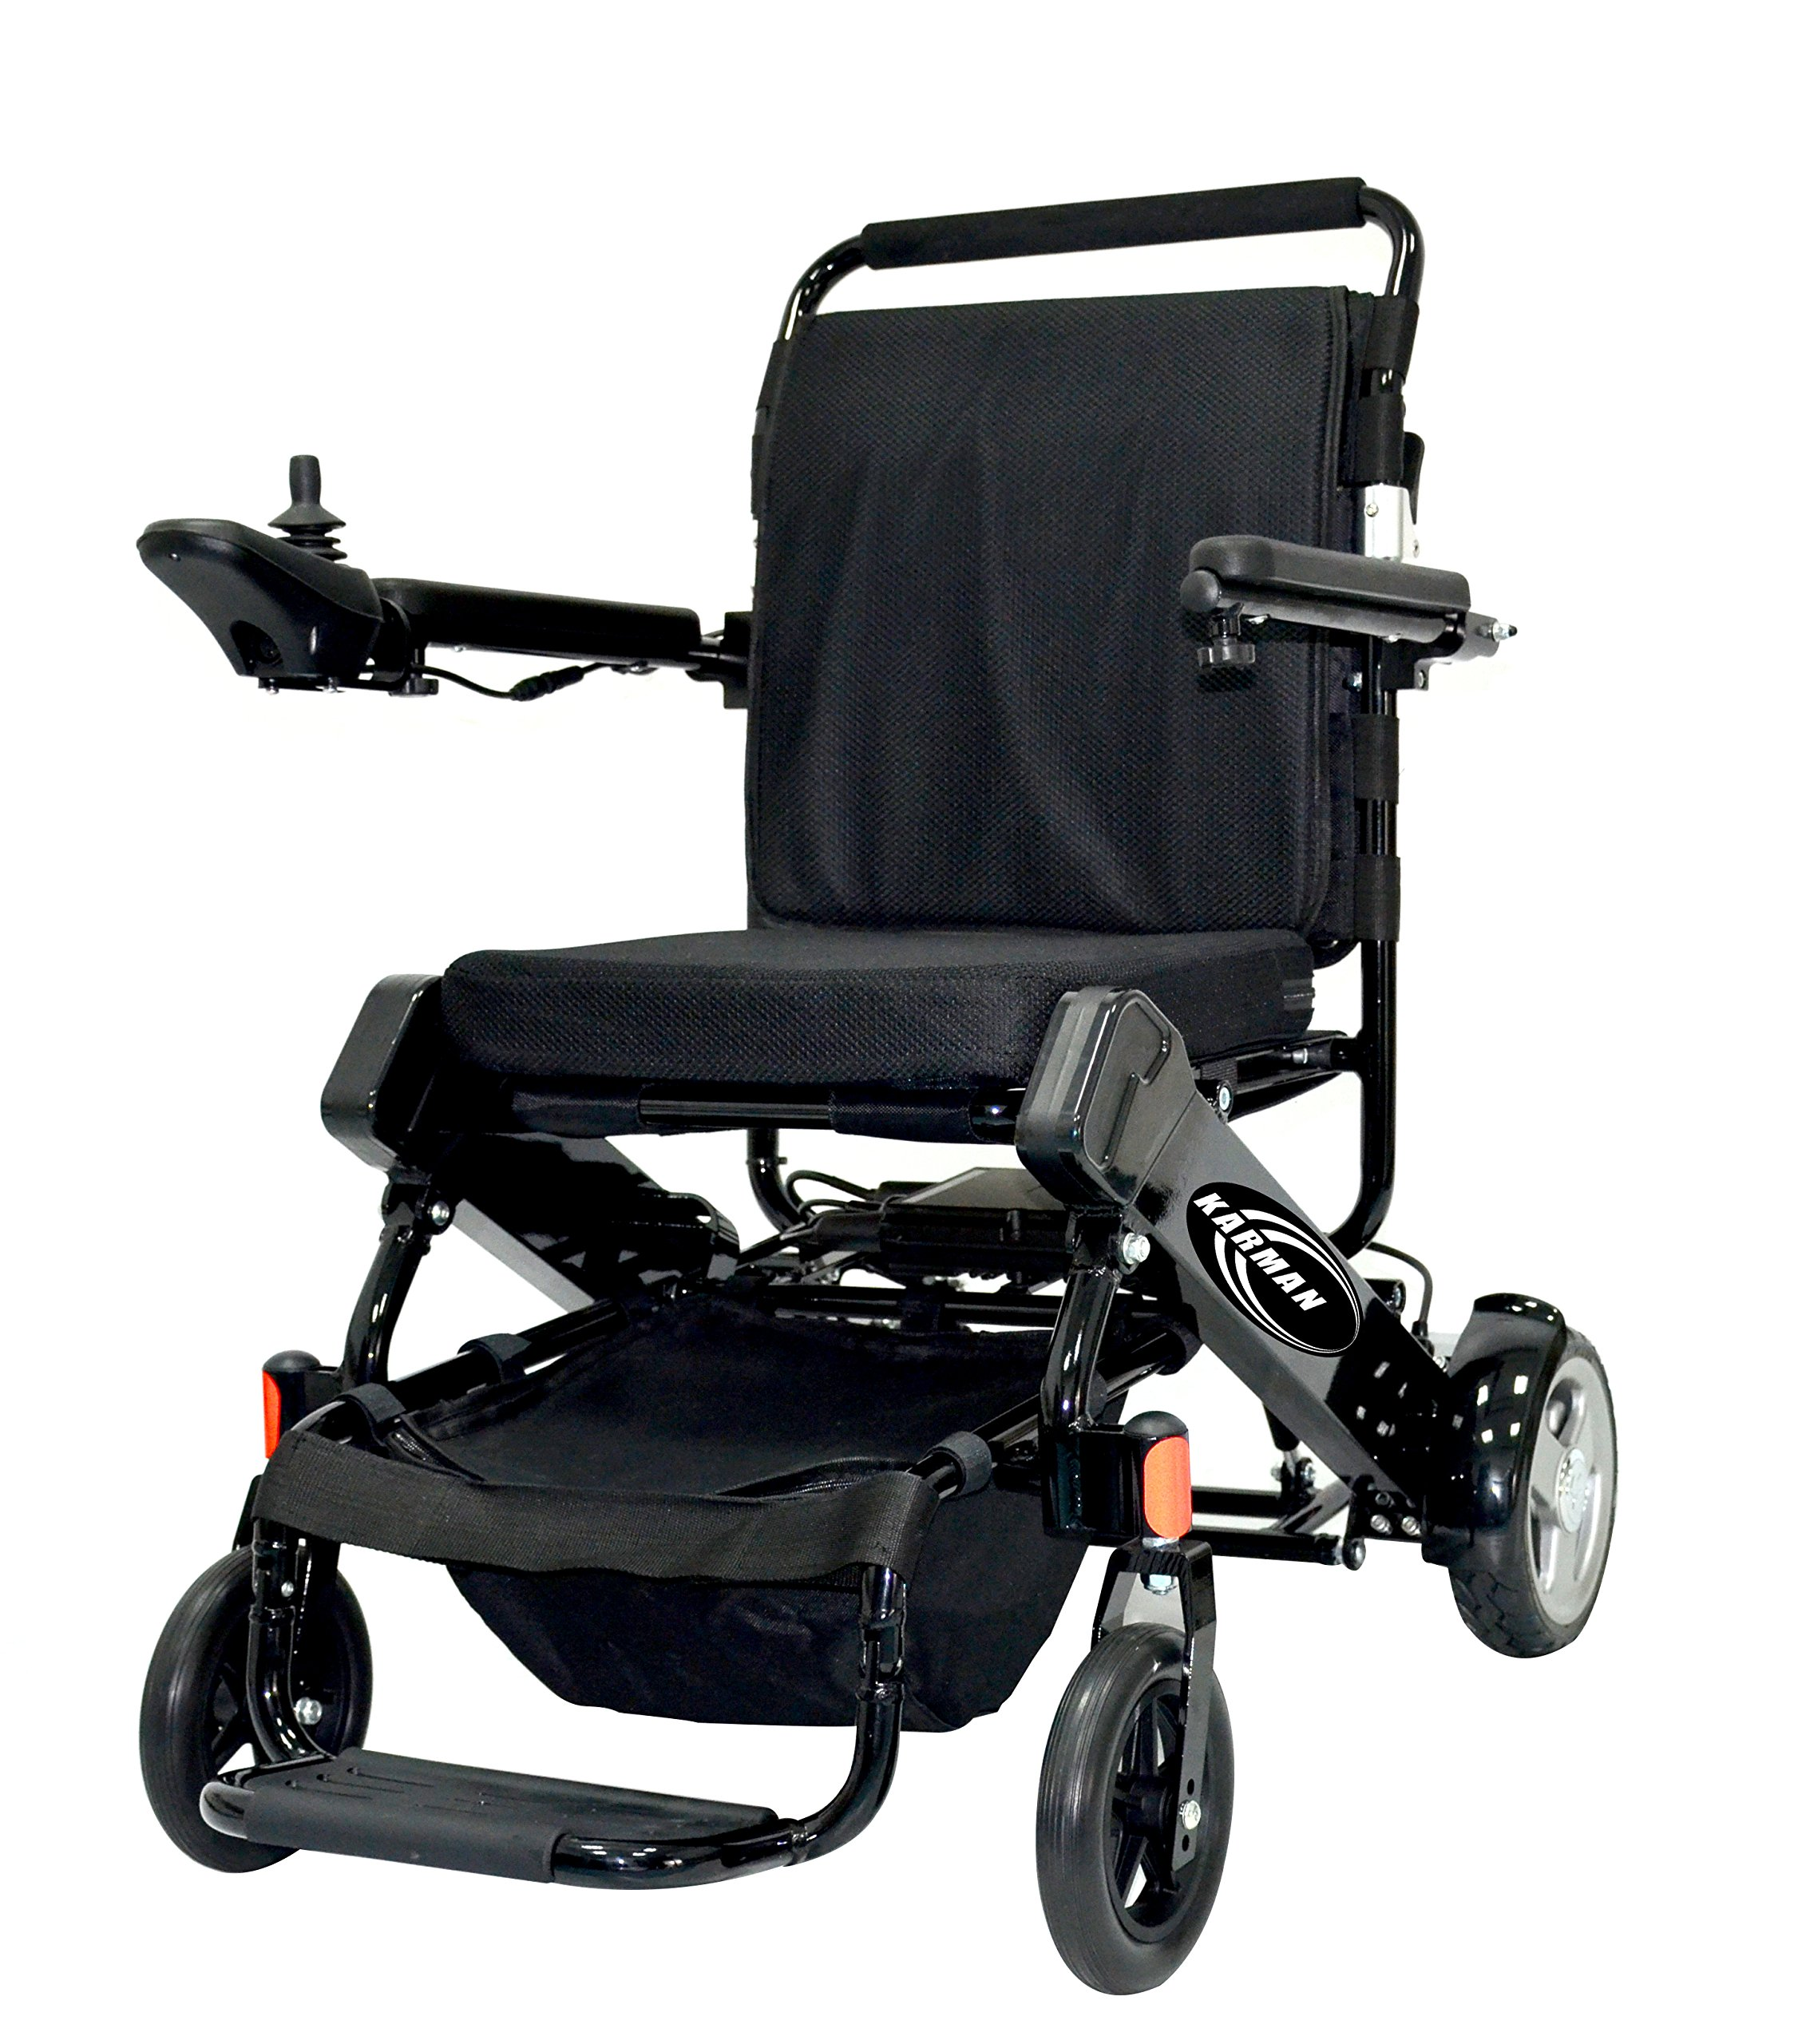 Karman Healthcare Tranzit Foldable Lightweight Power Wheelchair, Black, 42 Pound